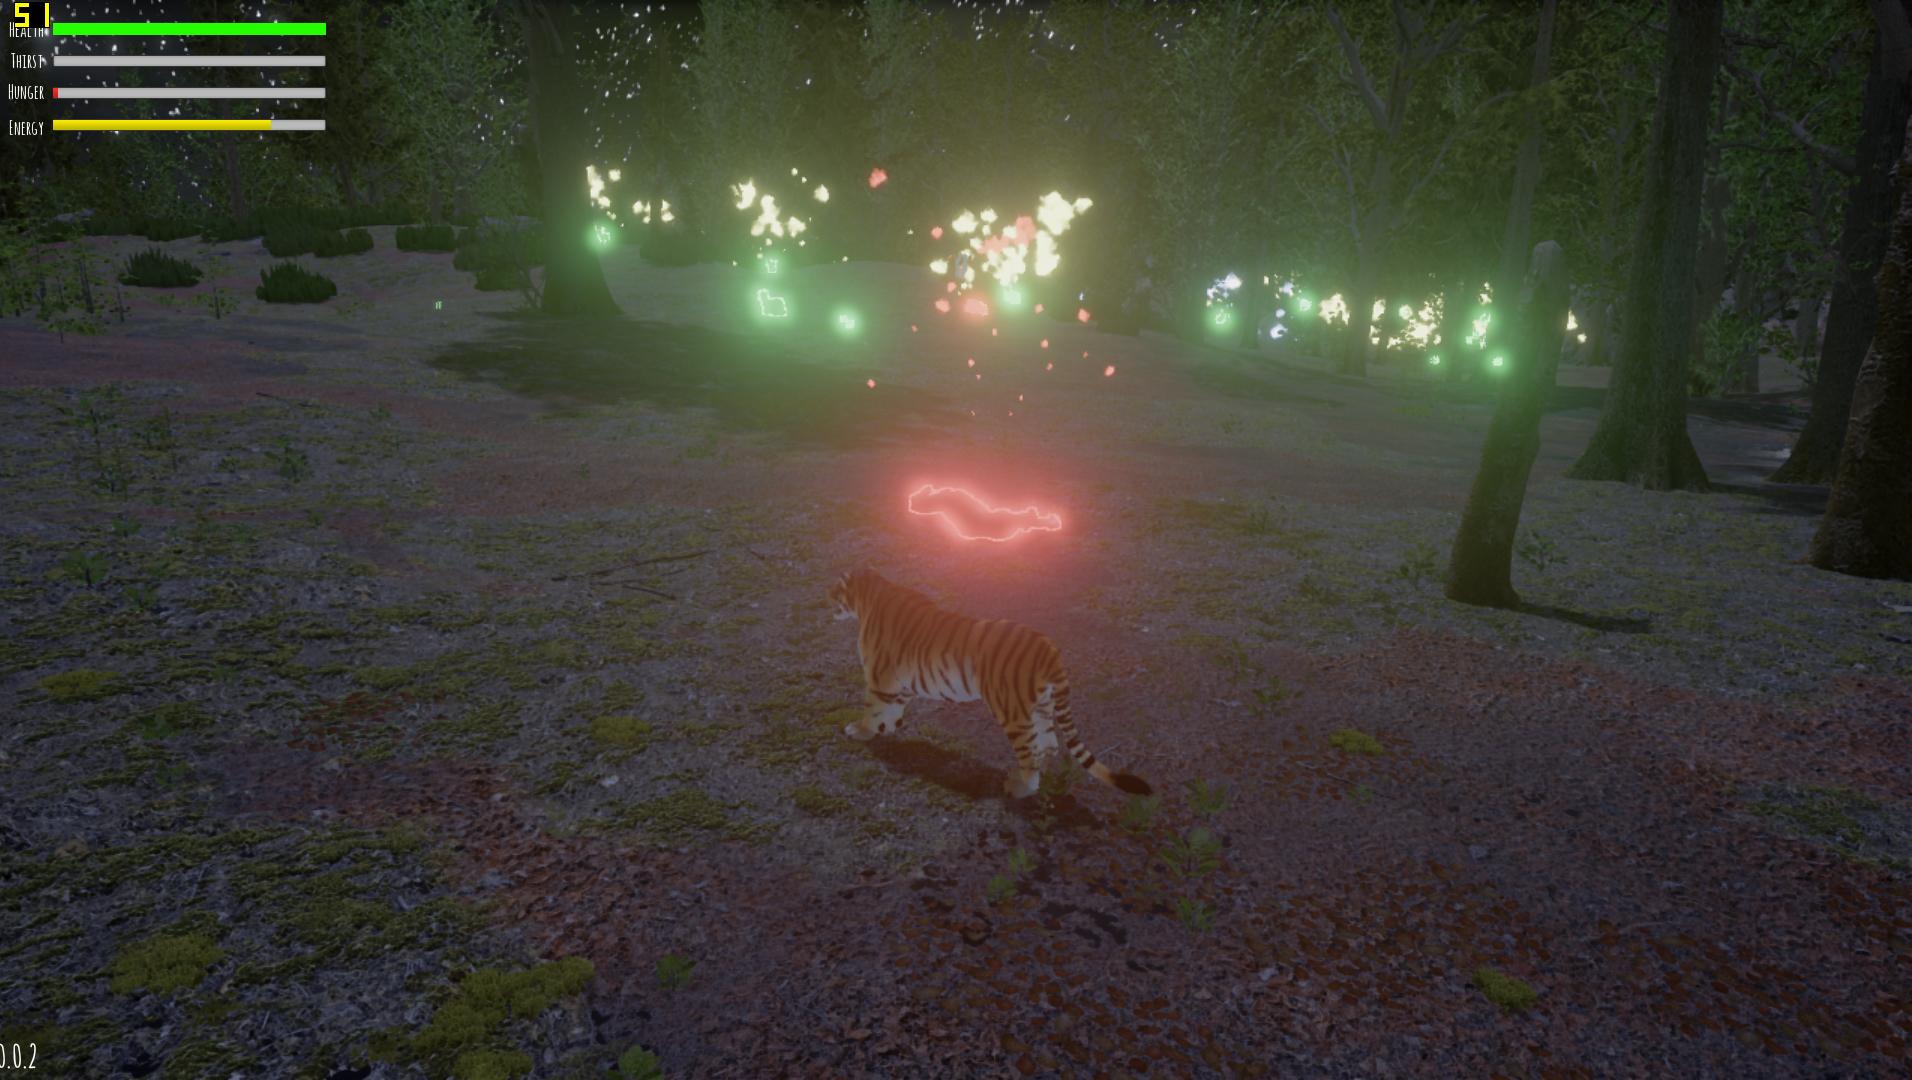 survivalizm - the animal simulator gameplay